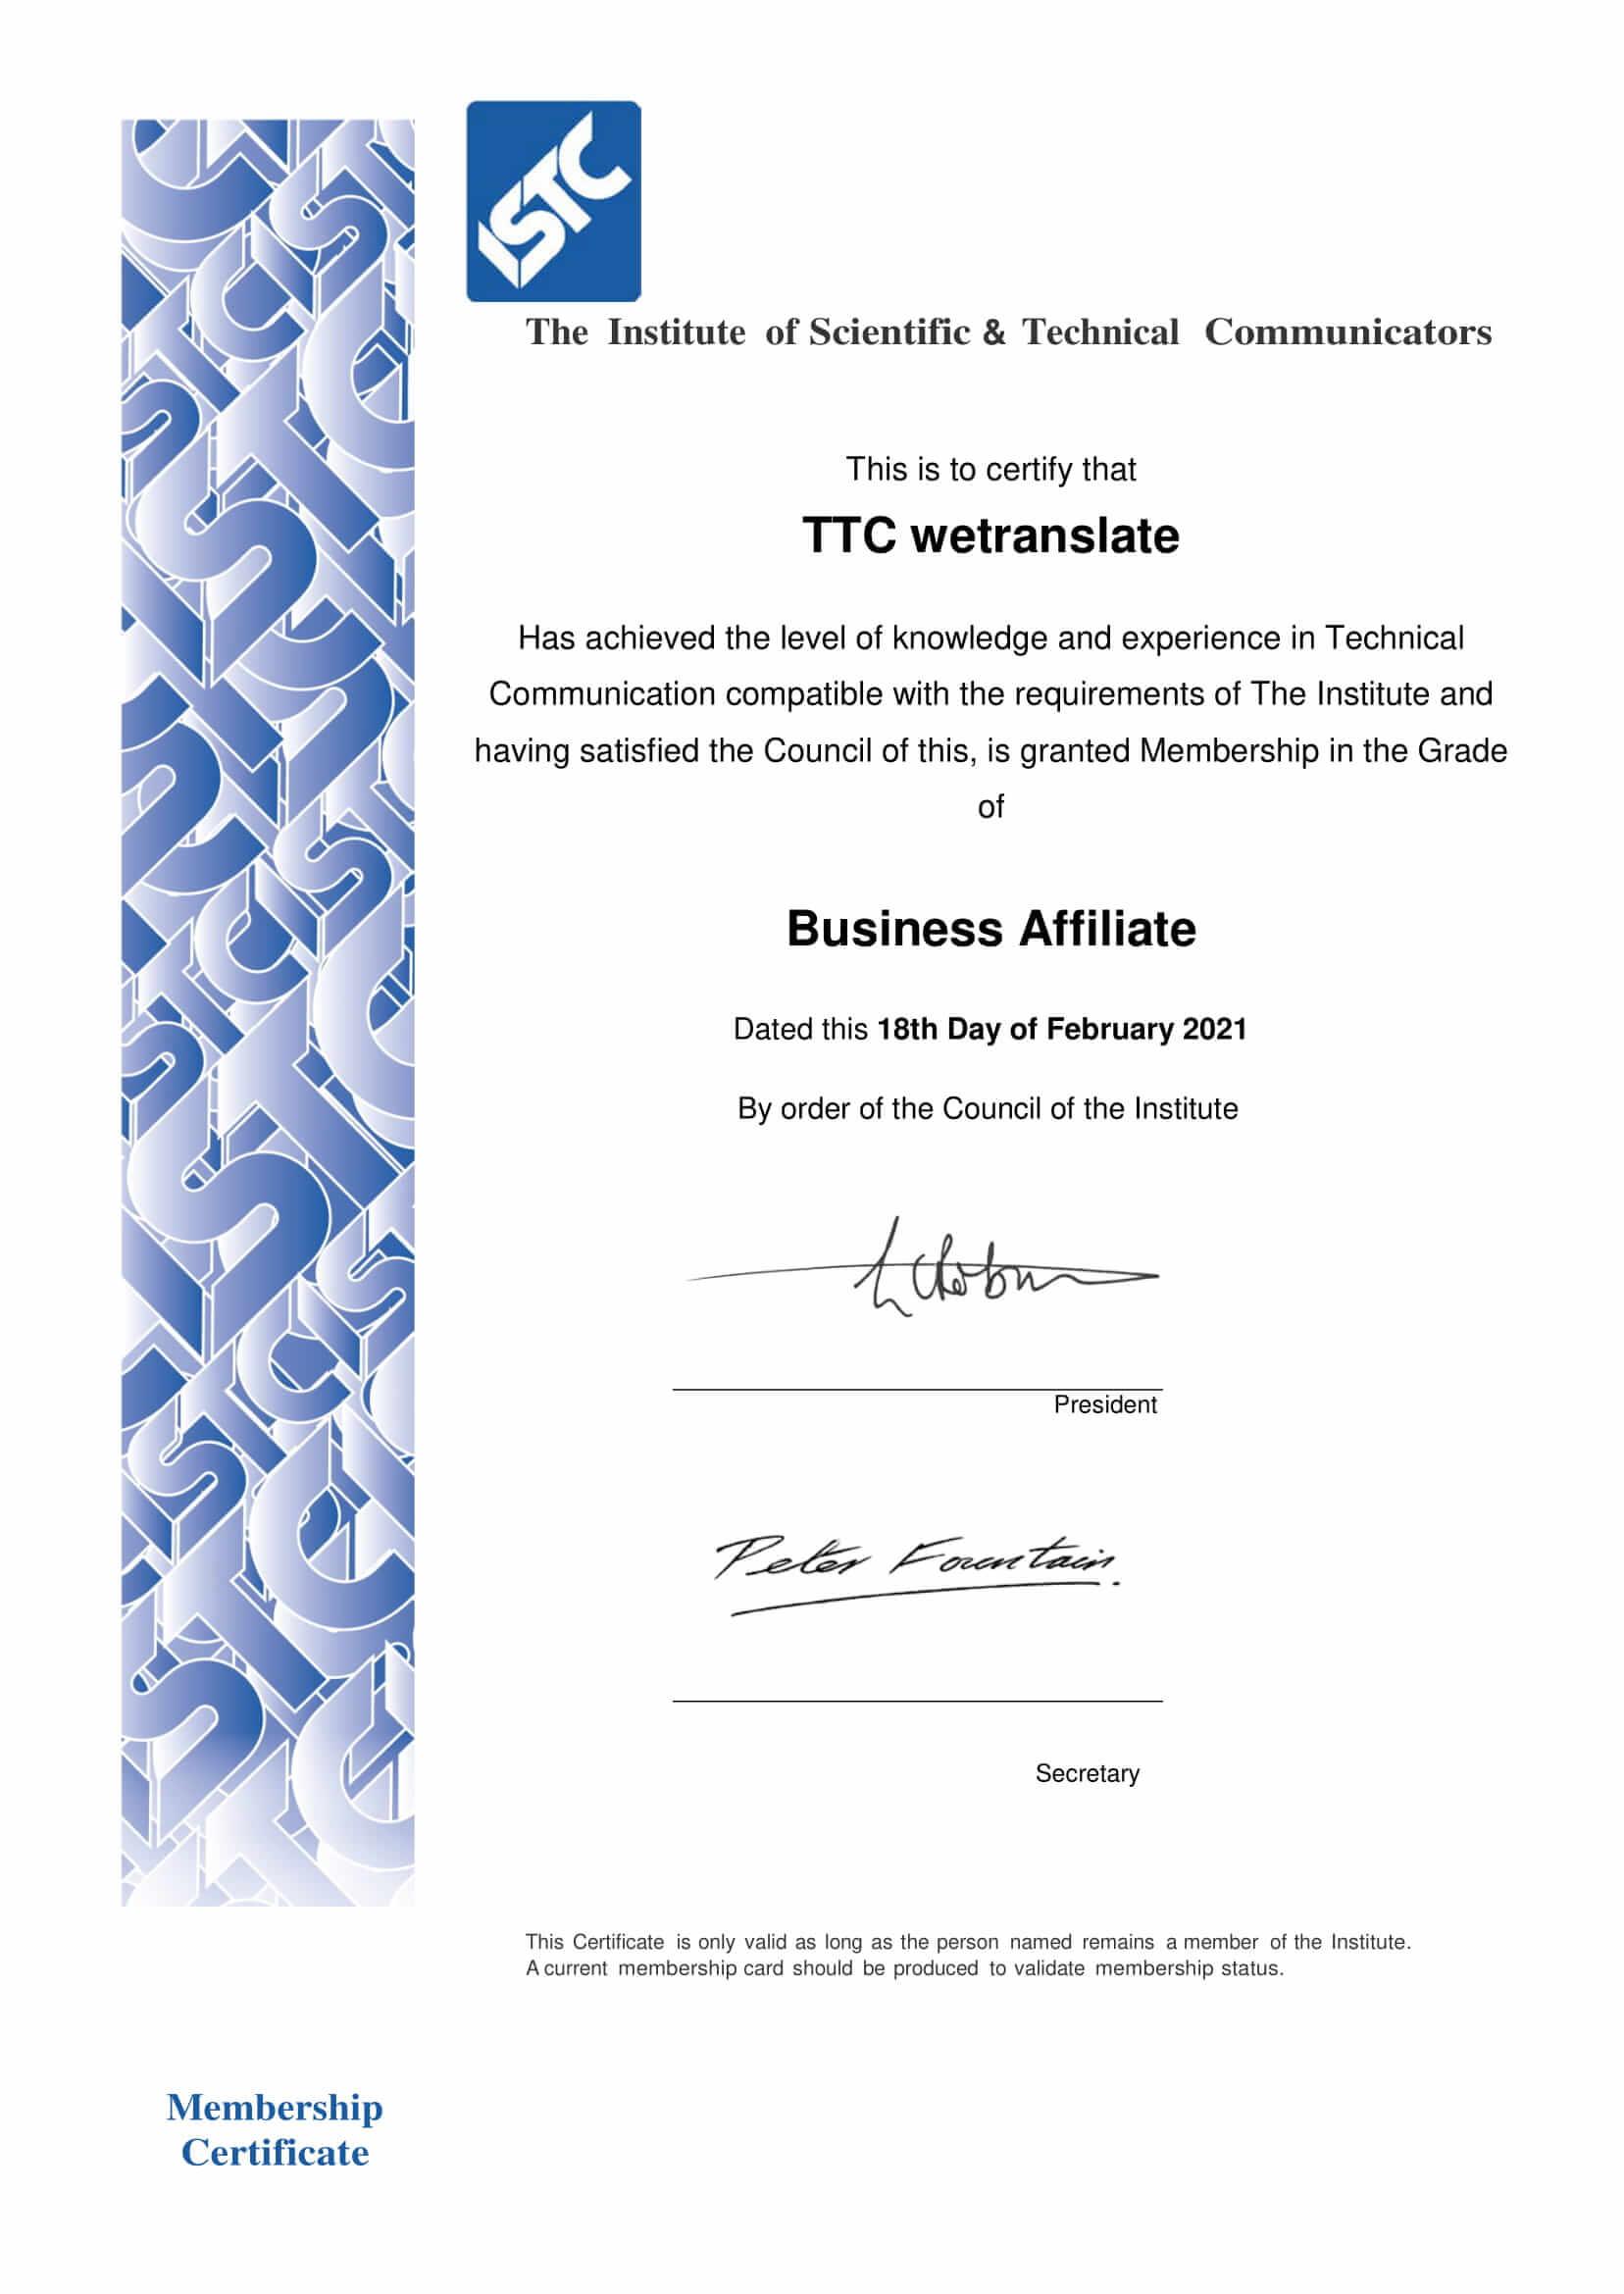 ISTC Membership Certificate TTC wetranslate